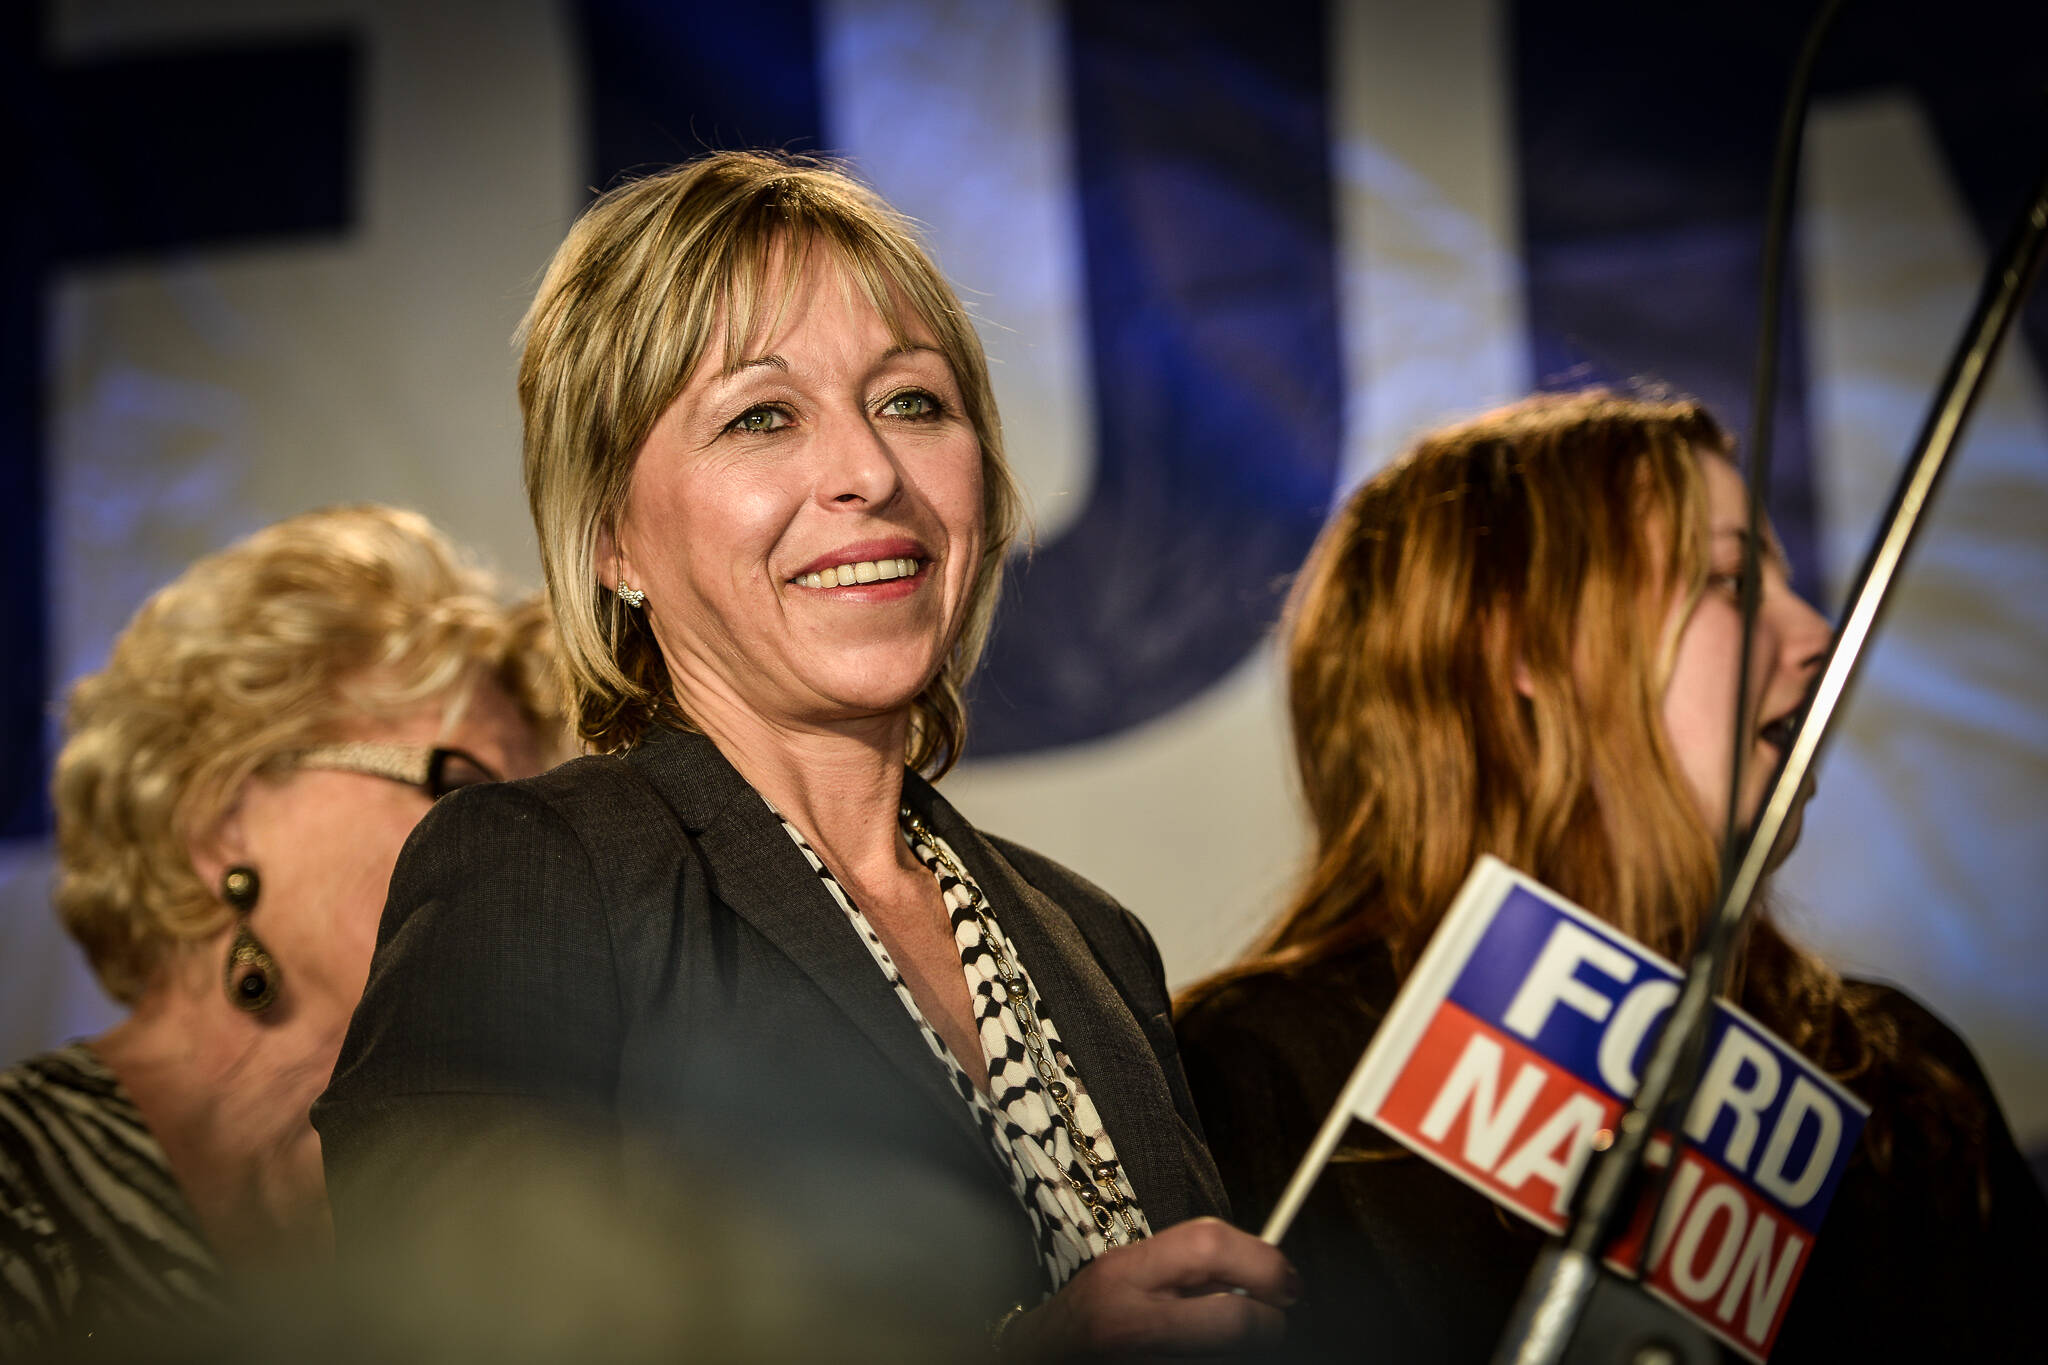 etobicoke north election results